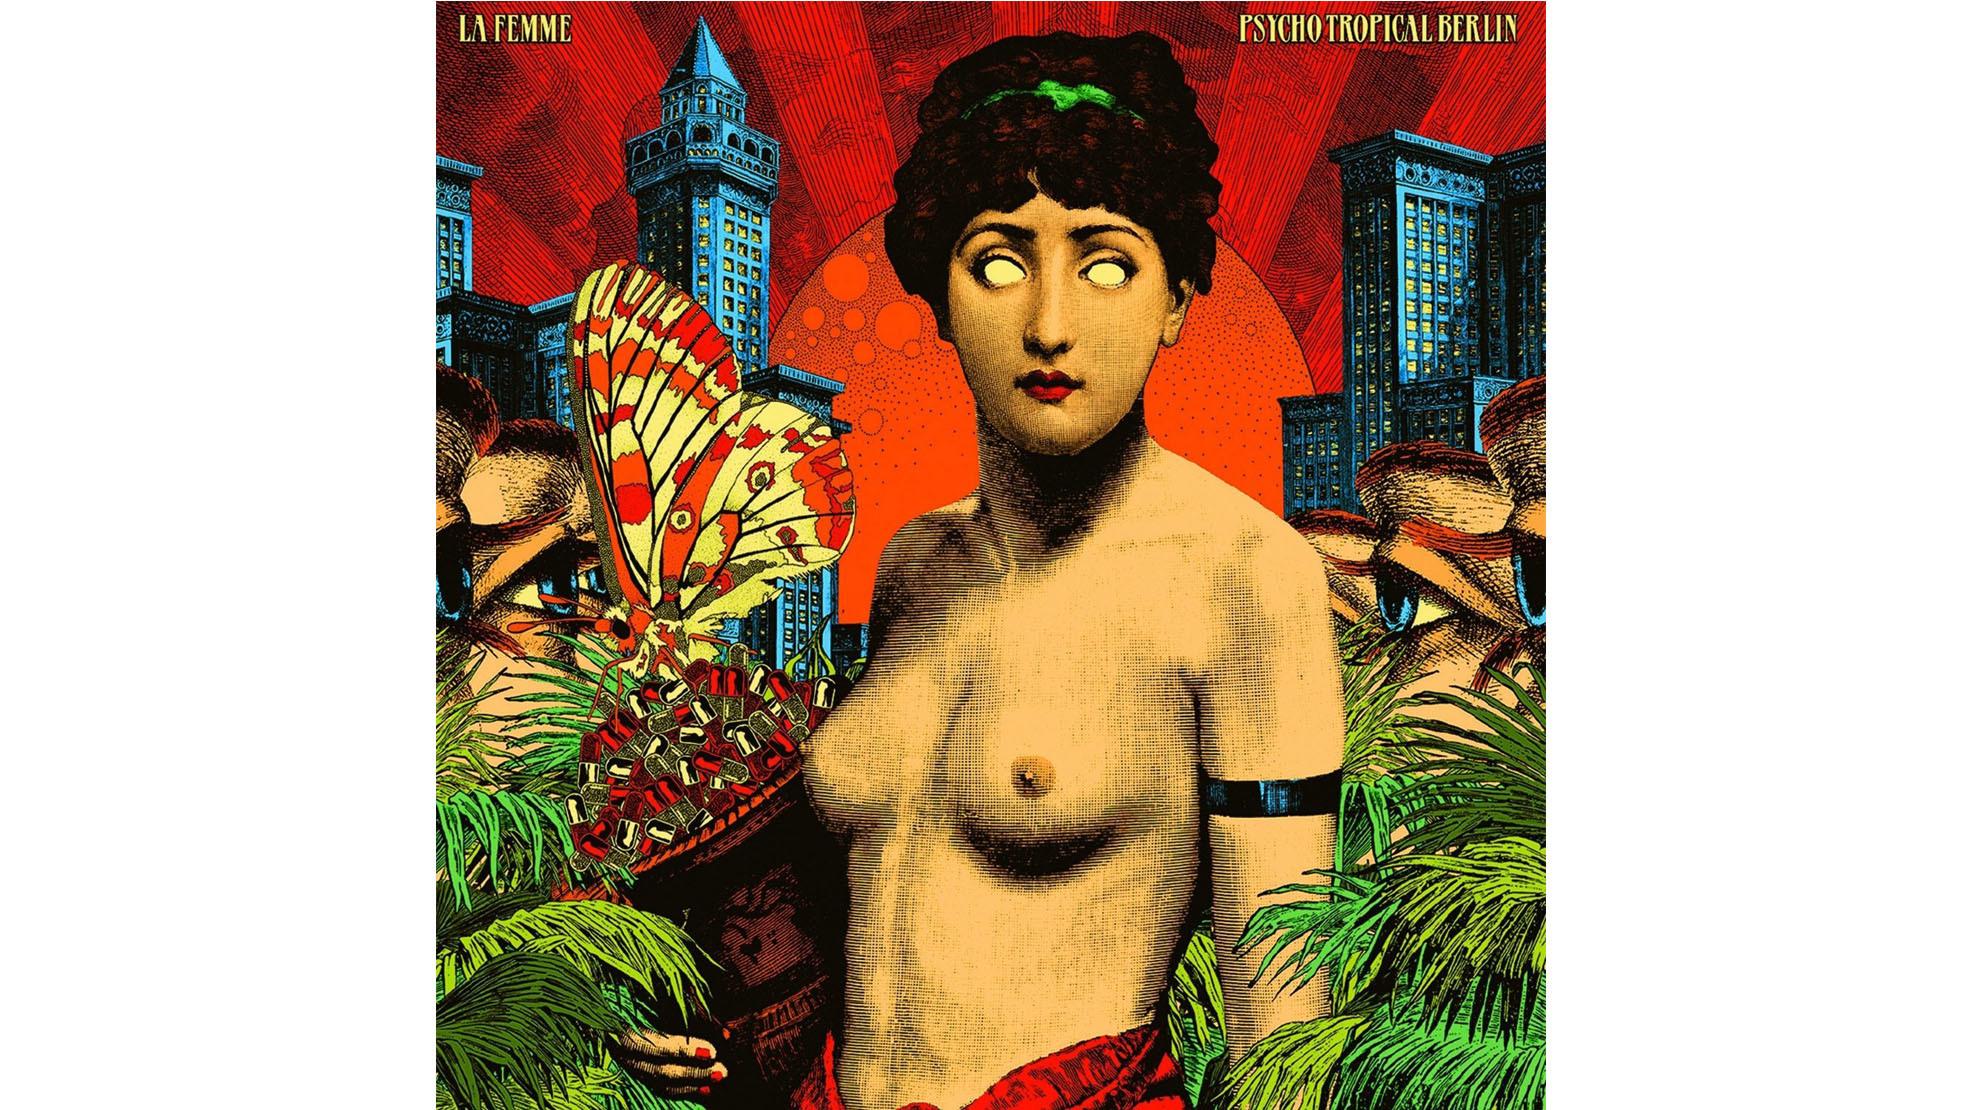 La Femme • Psycho Tropical Berlin (2013)